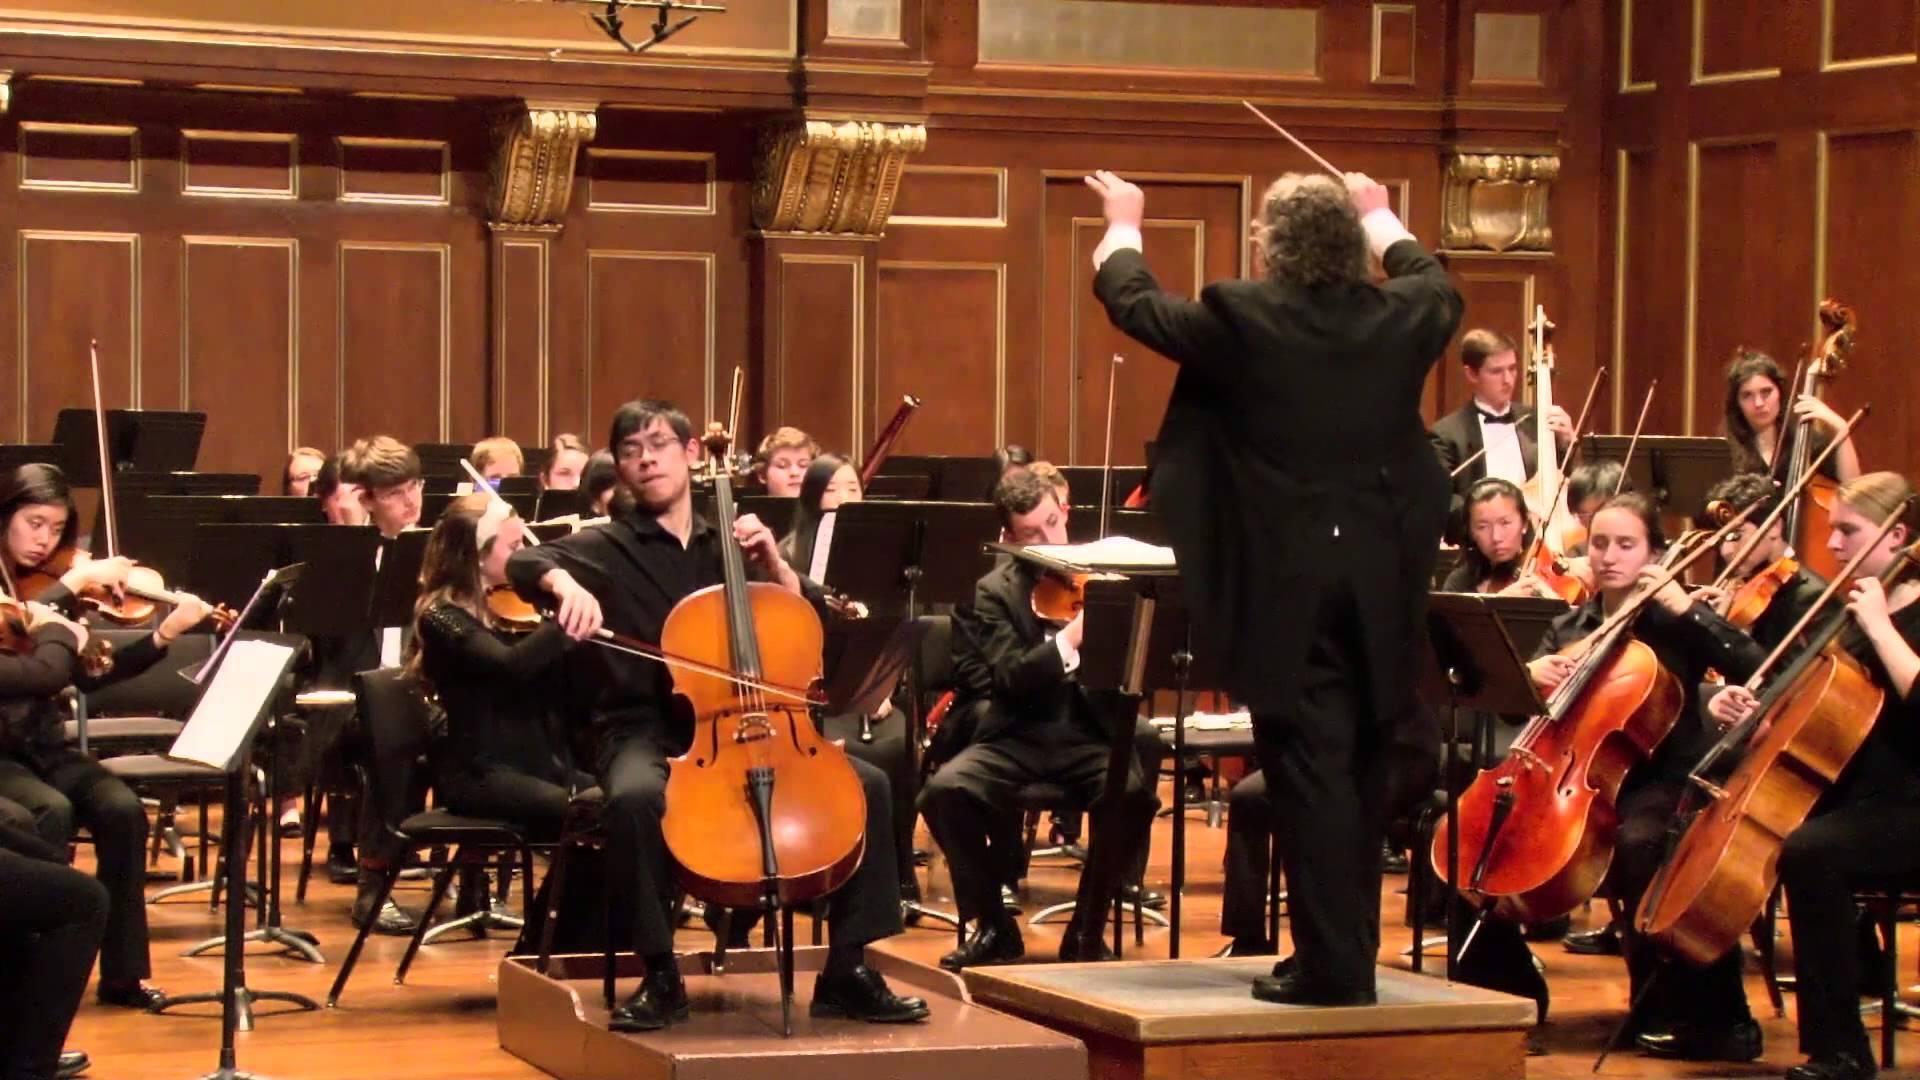 Video Symphony EnterTraining Inc - educationnews.org